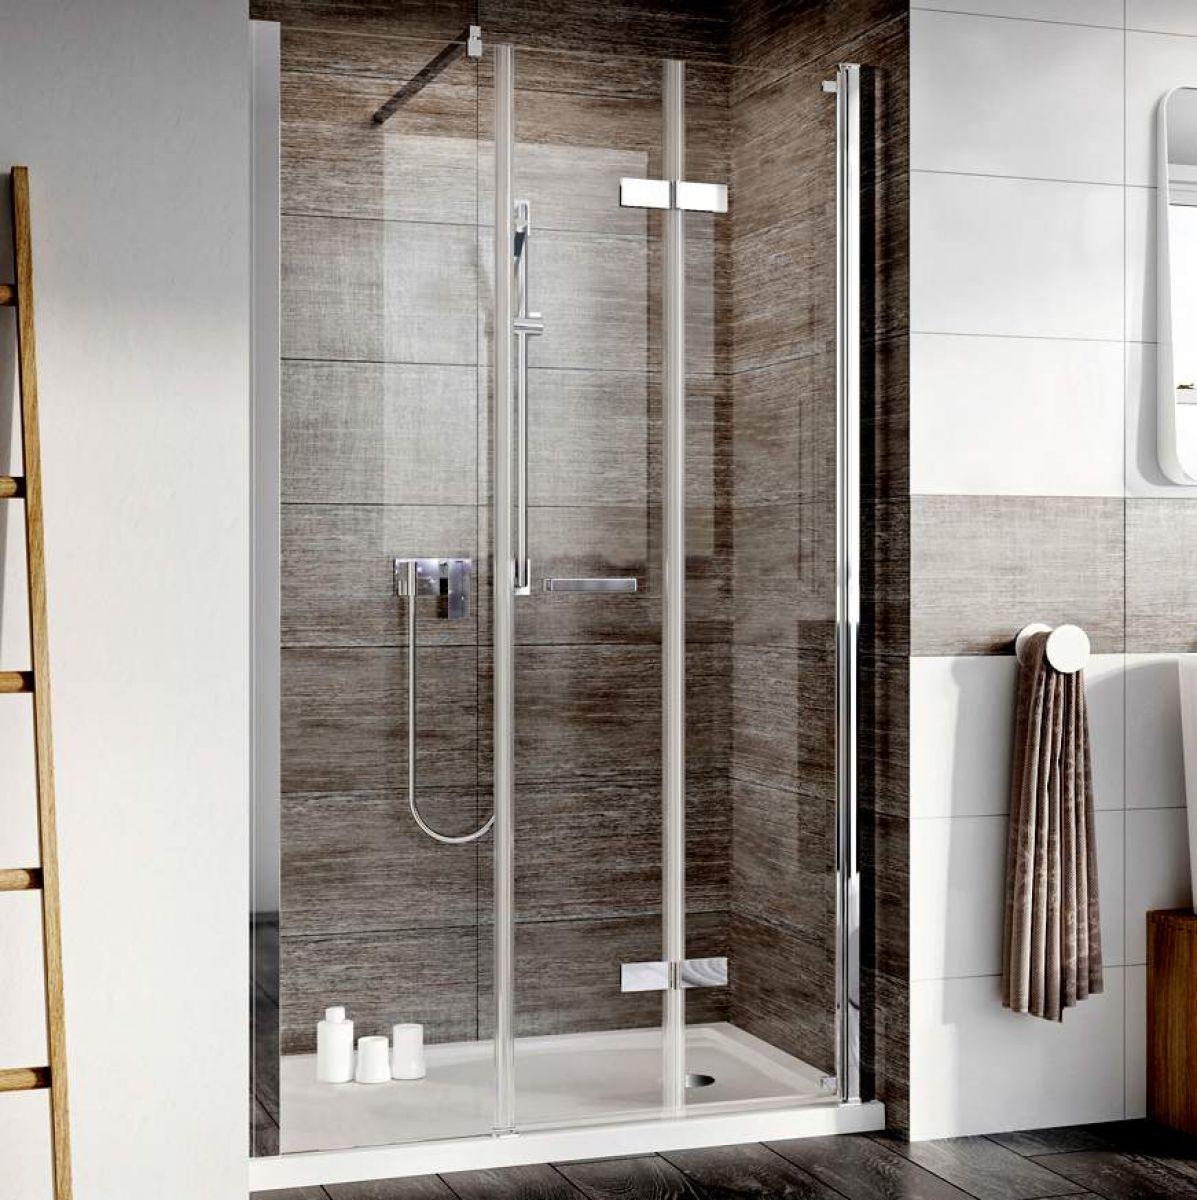 Roman Innov8 Inward Opening Bi Fold Shower Door With In Line Panel